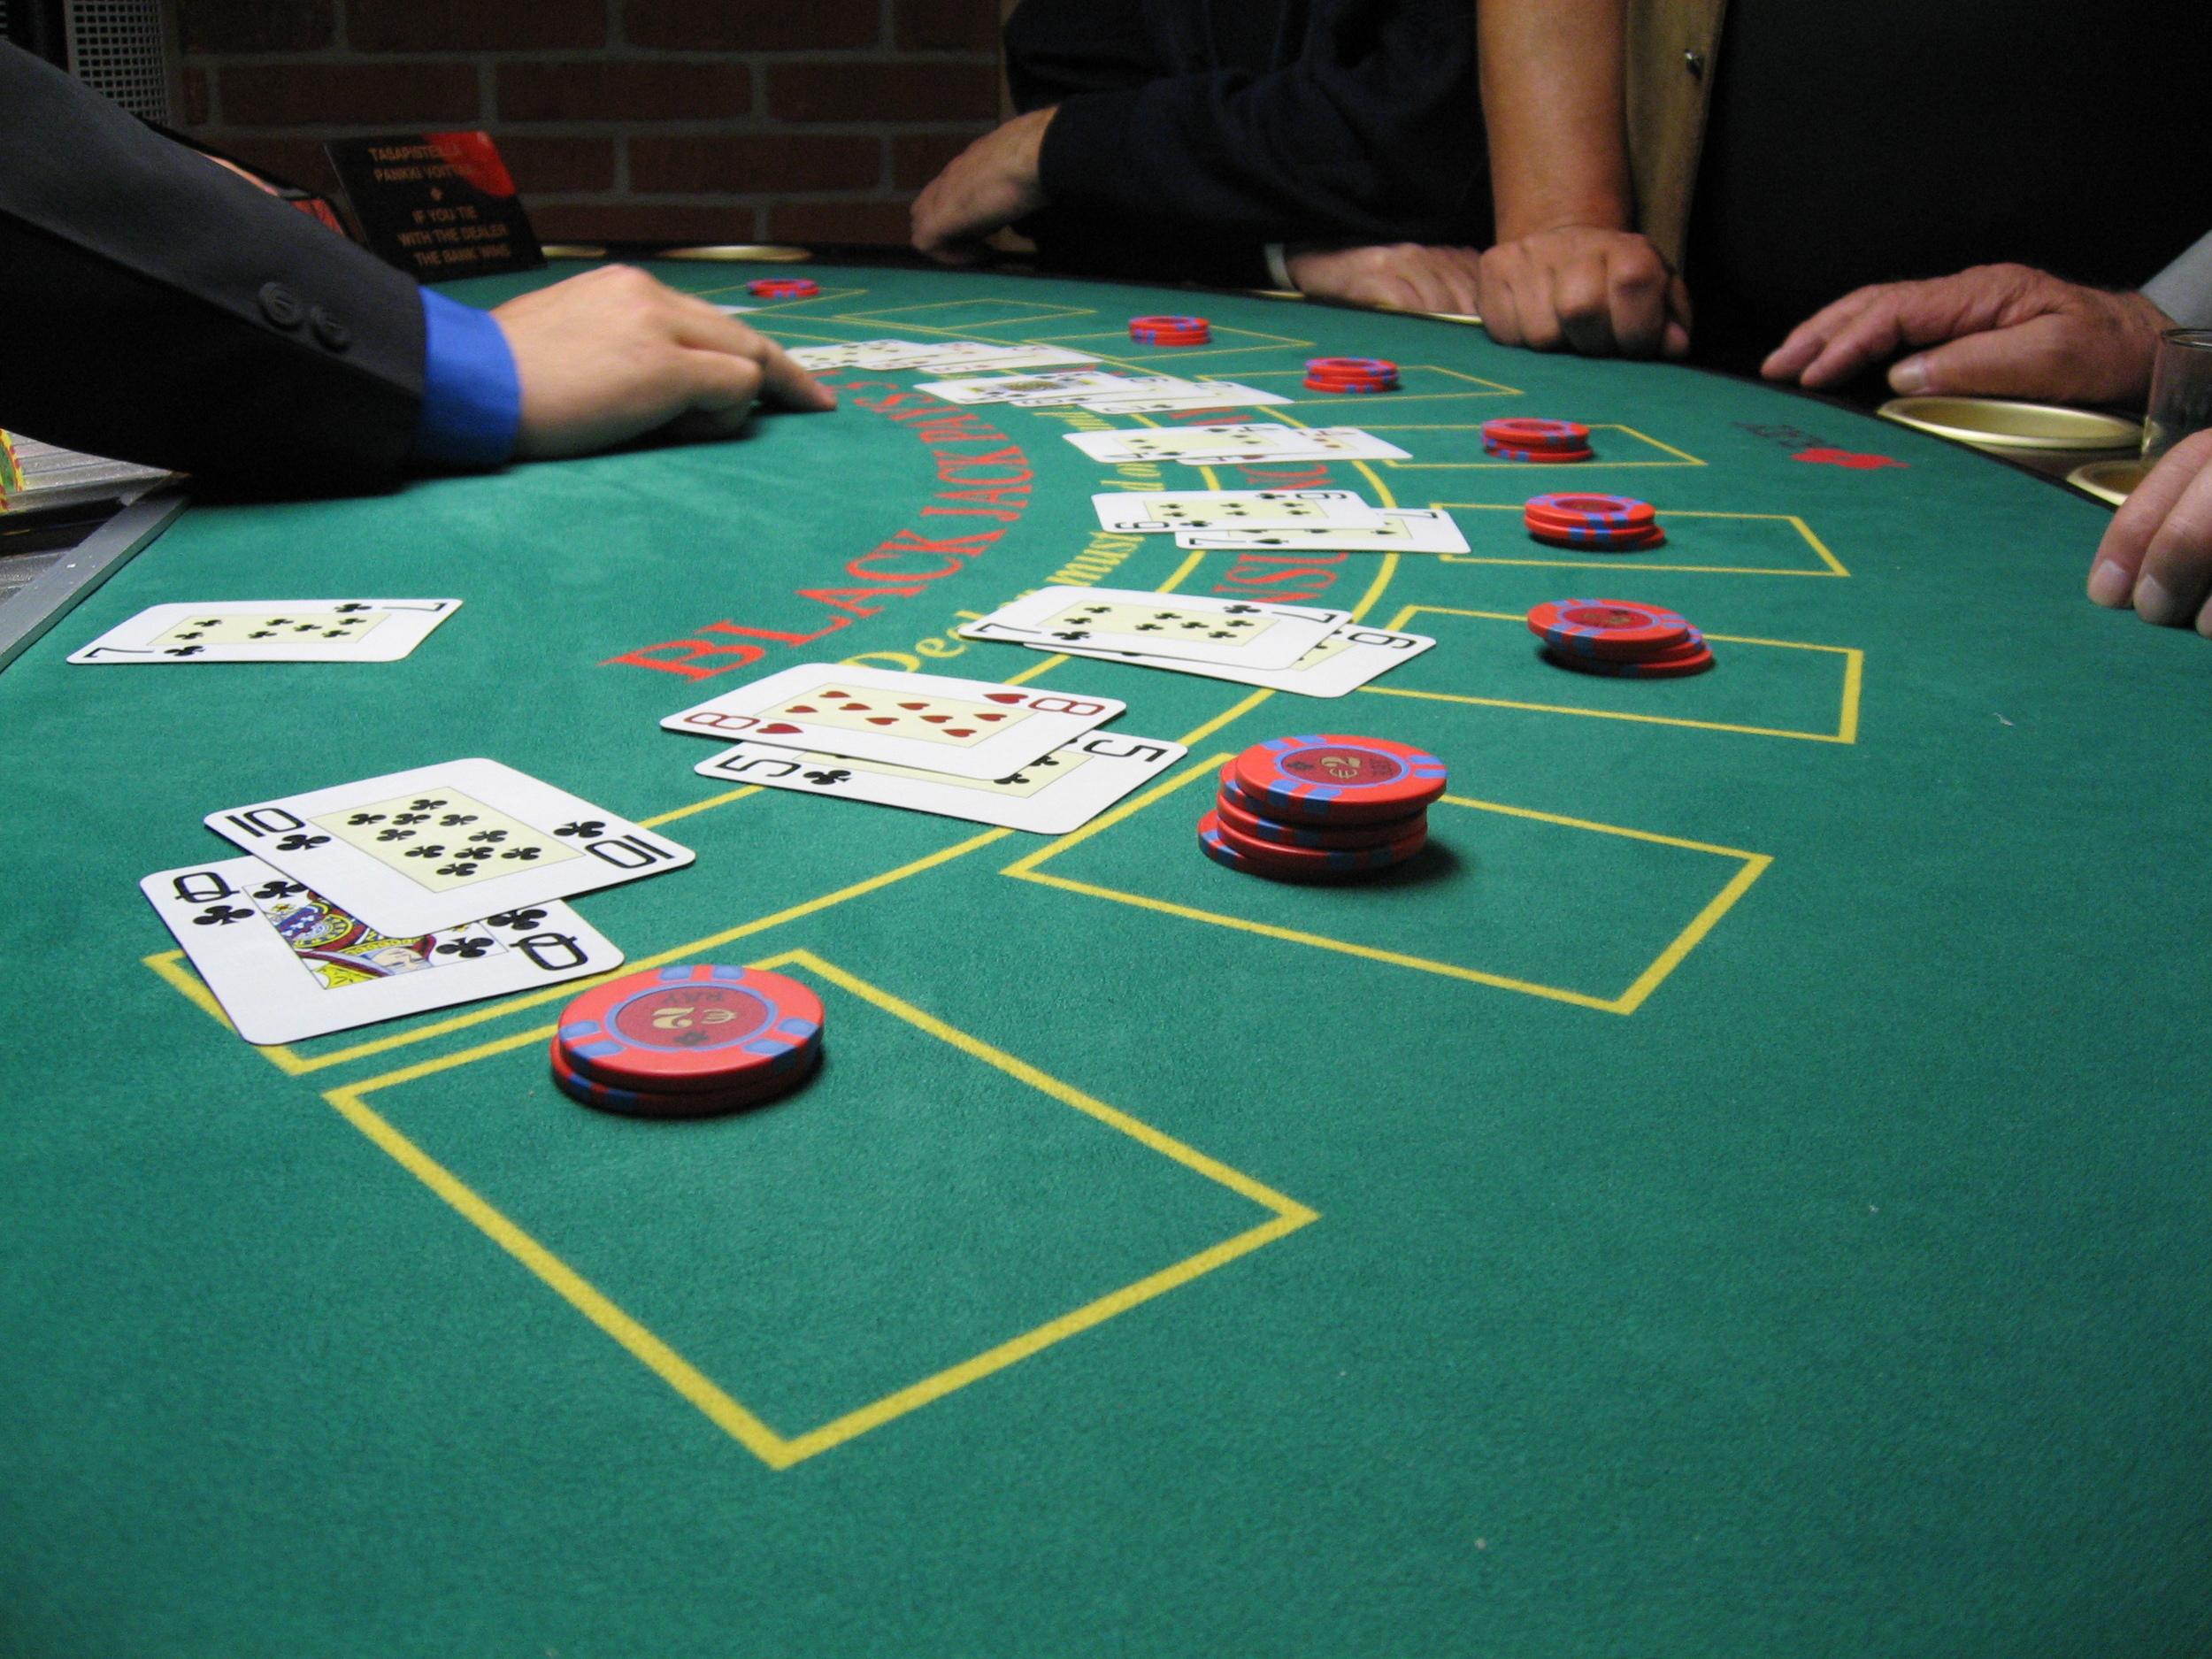 Blackjack Table Labeled for Reuse